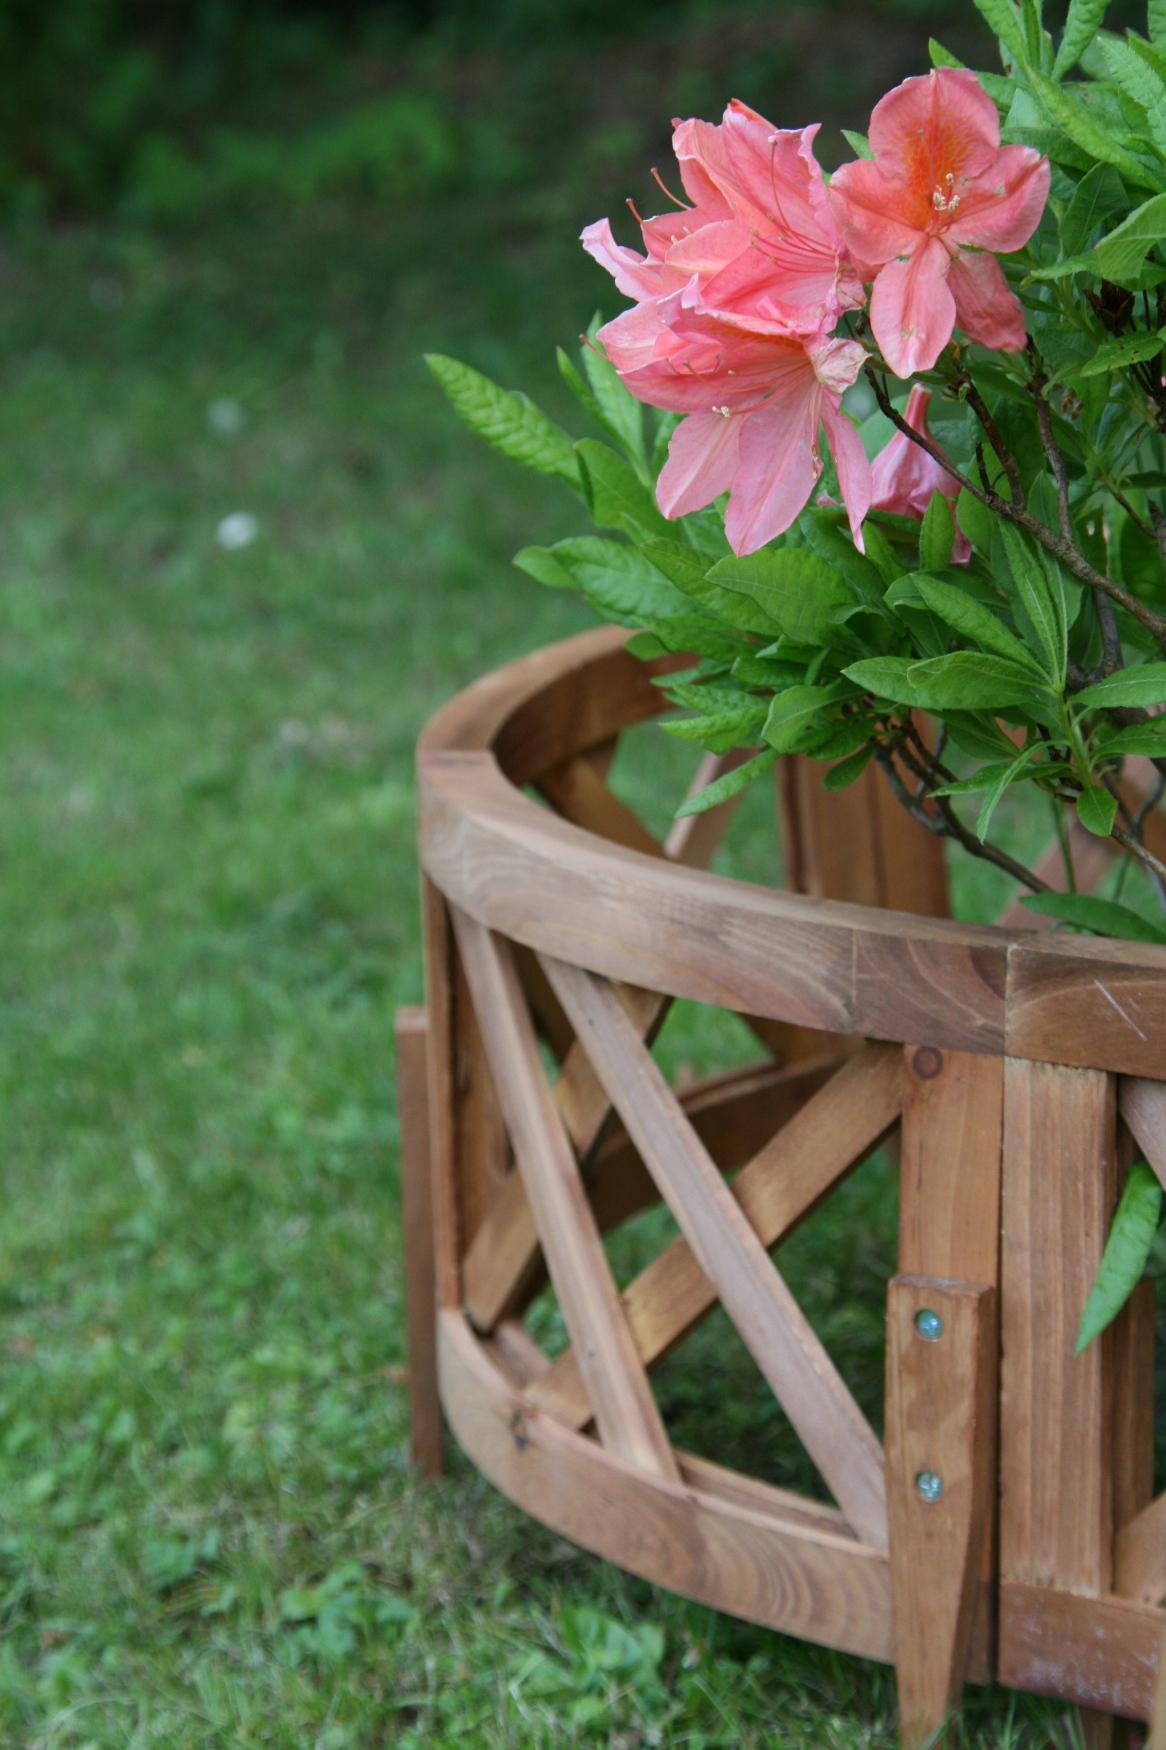 6 tlg Gartenzaun NATUR Pflanzenbegrenzung Beetzaun Beeteinfassung